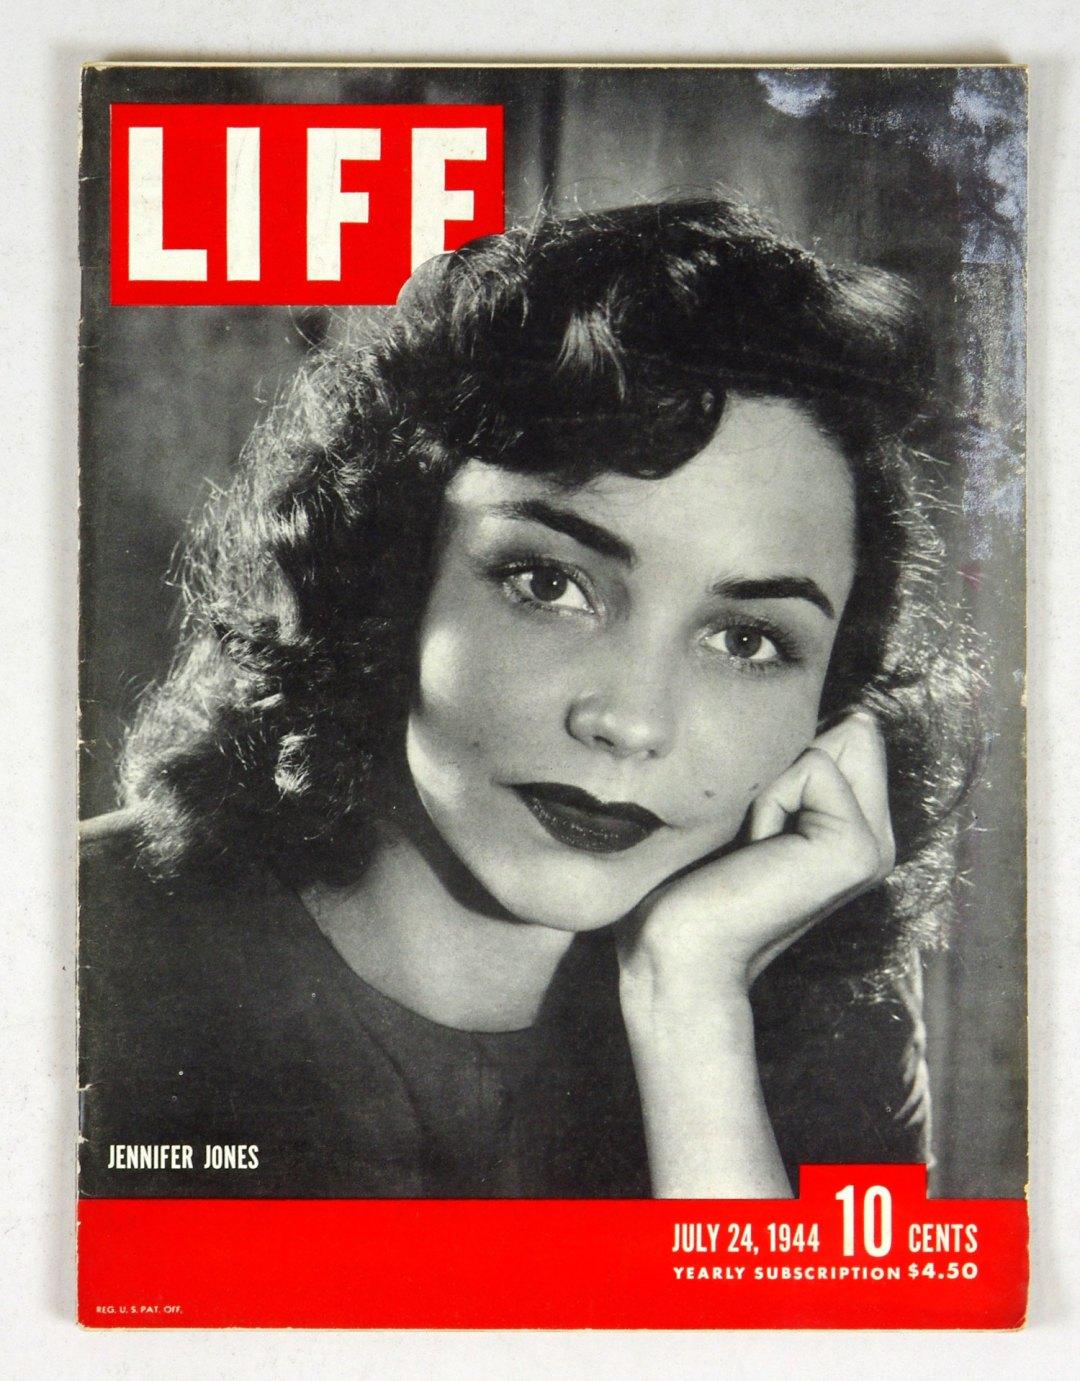 LIFE Magazine 1944 July 24 Jennifer Jones